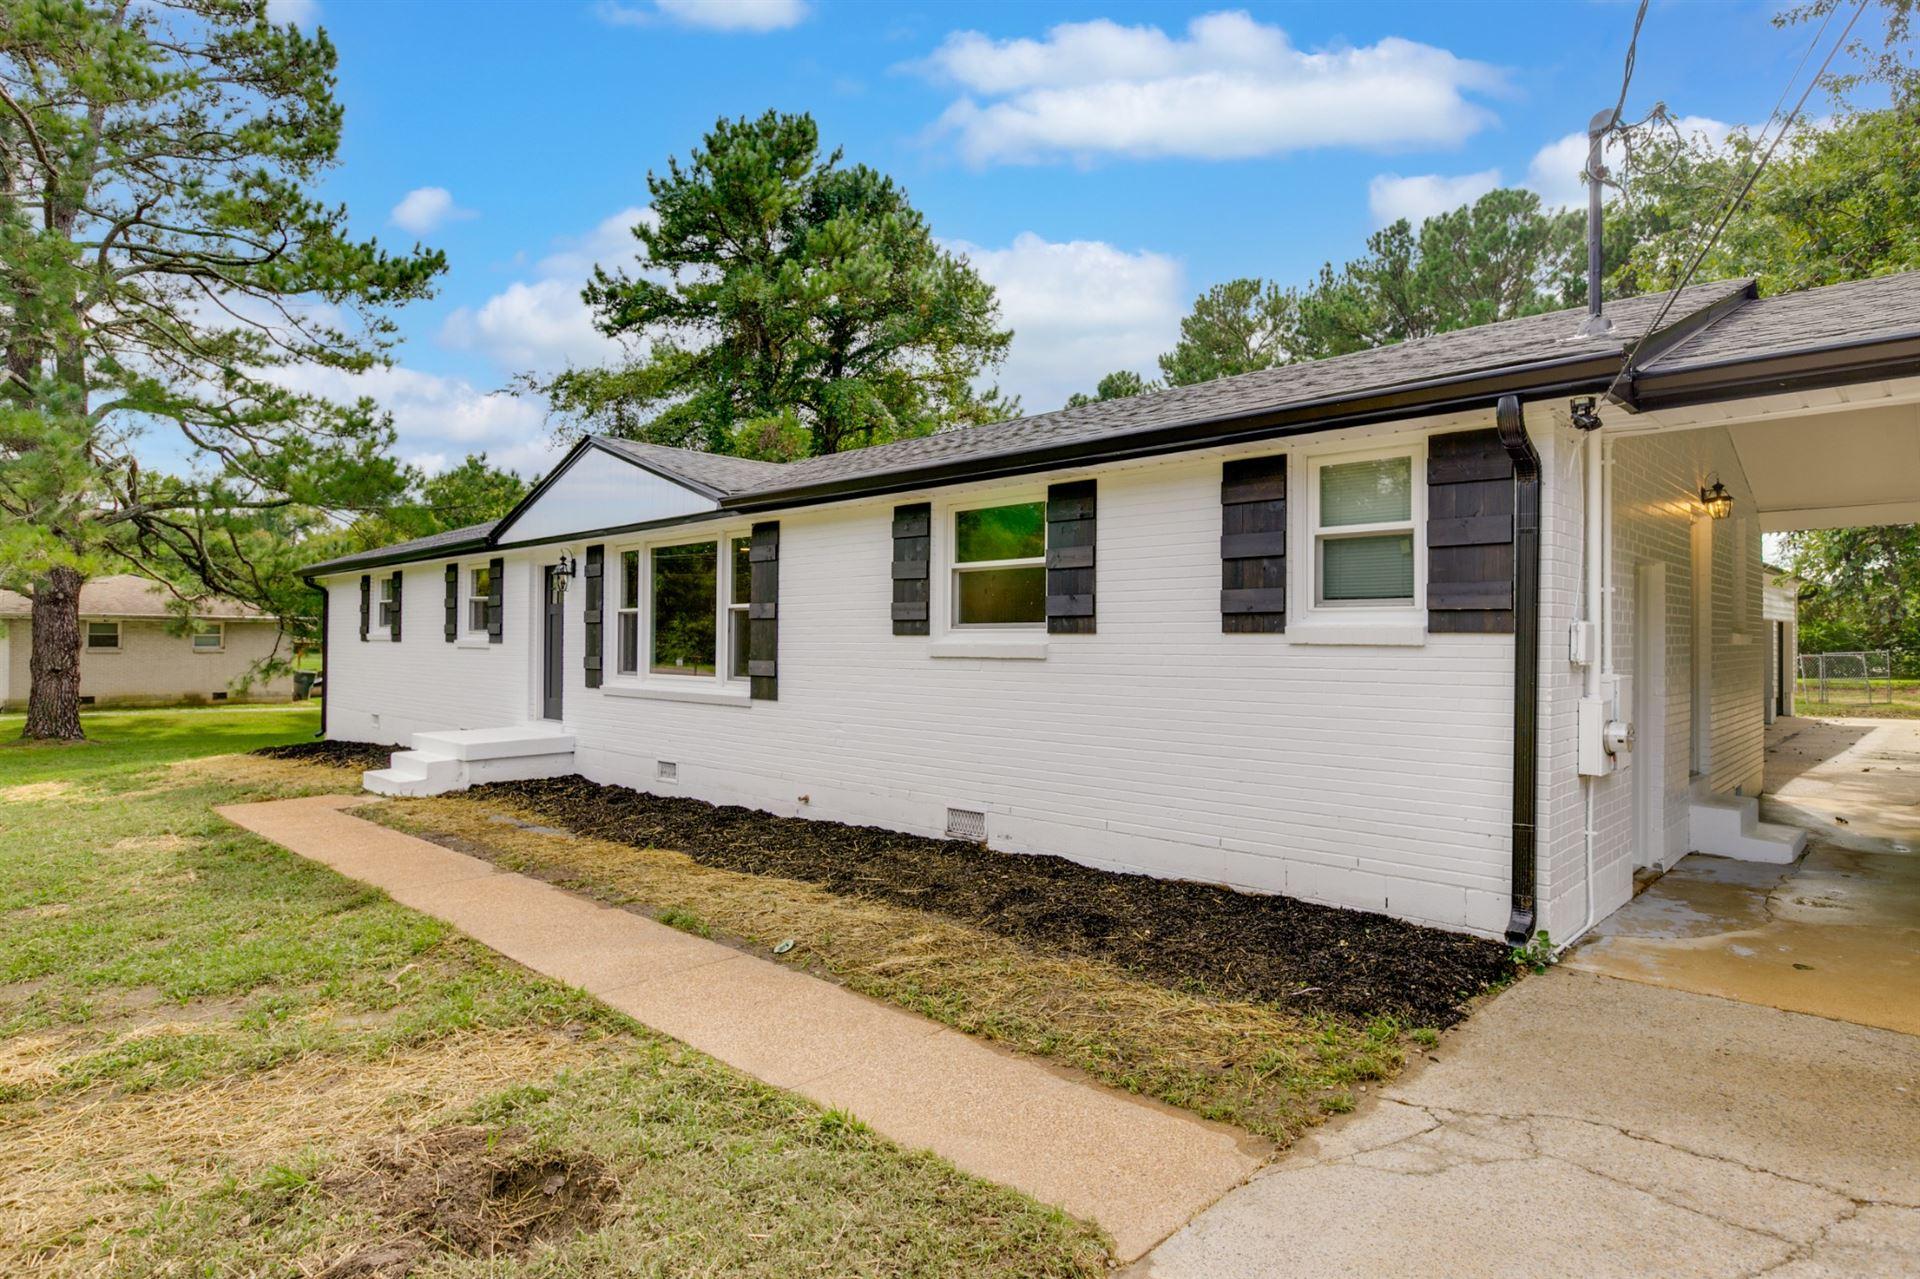 Photo of 2245 Cabin Hill Rd, Nashville, TN 37214 (MLS # 2293230)